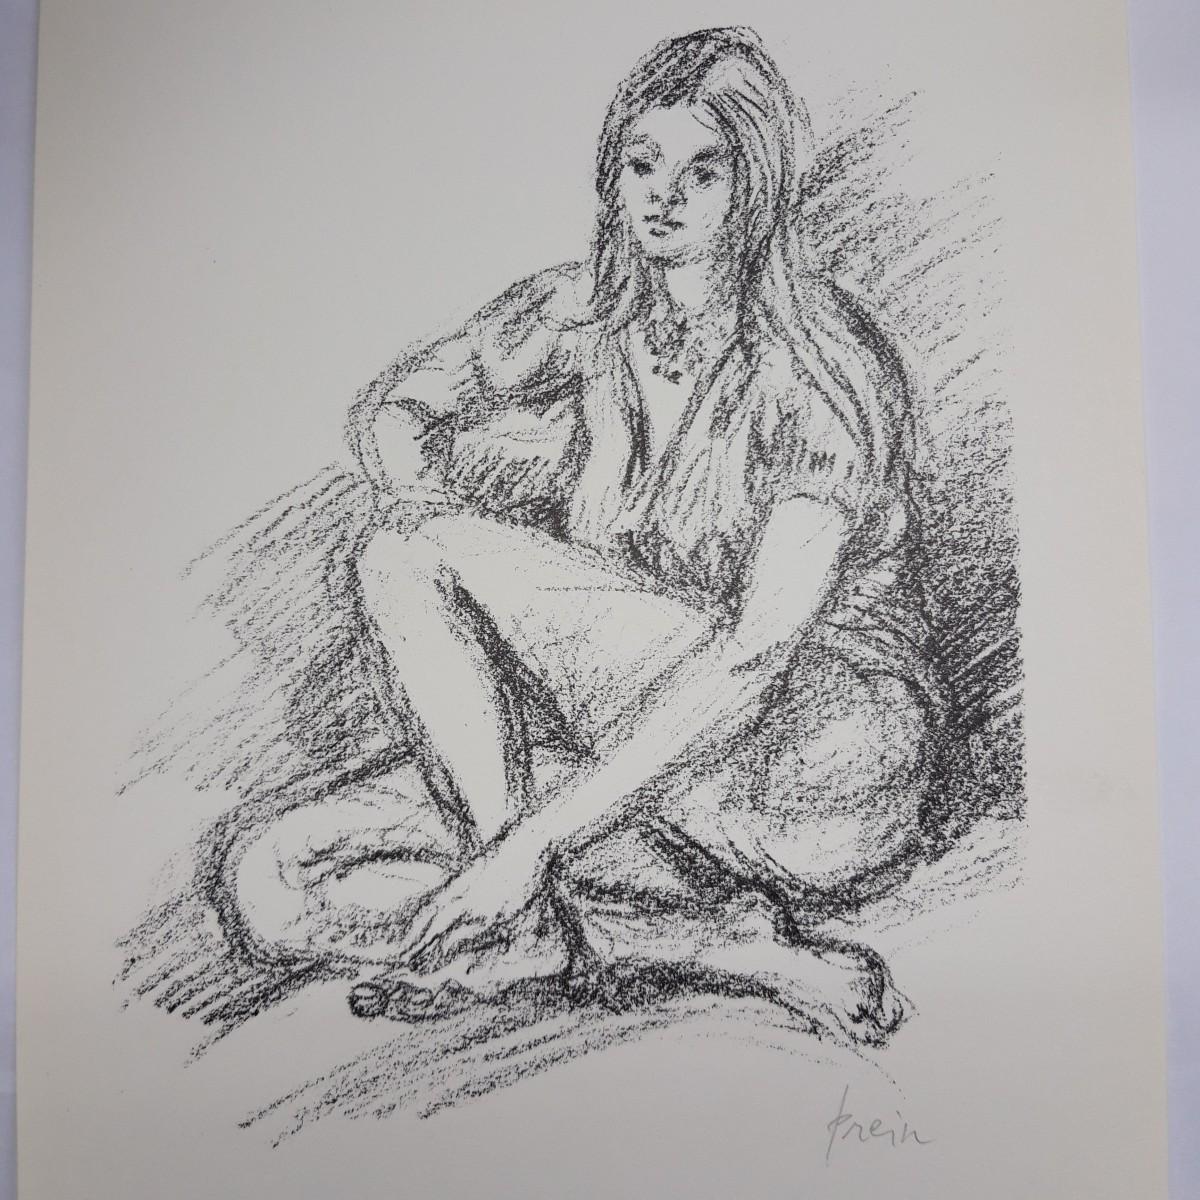 Jan Prein - 1-Farben-Lithografie 'Sabine' kopen? Bied vanaf 45!